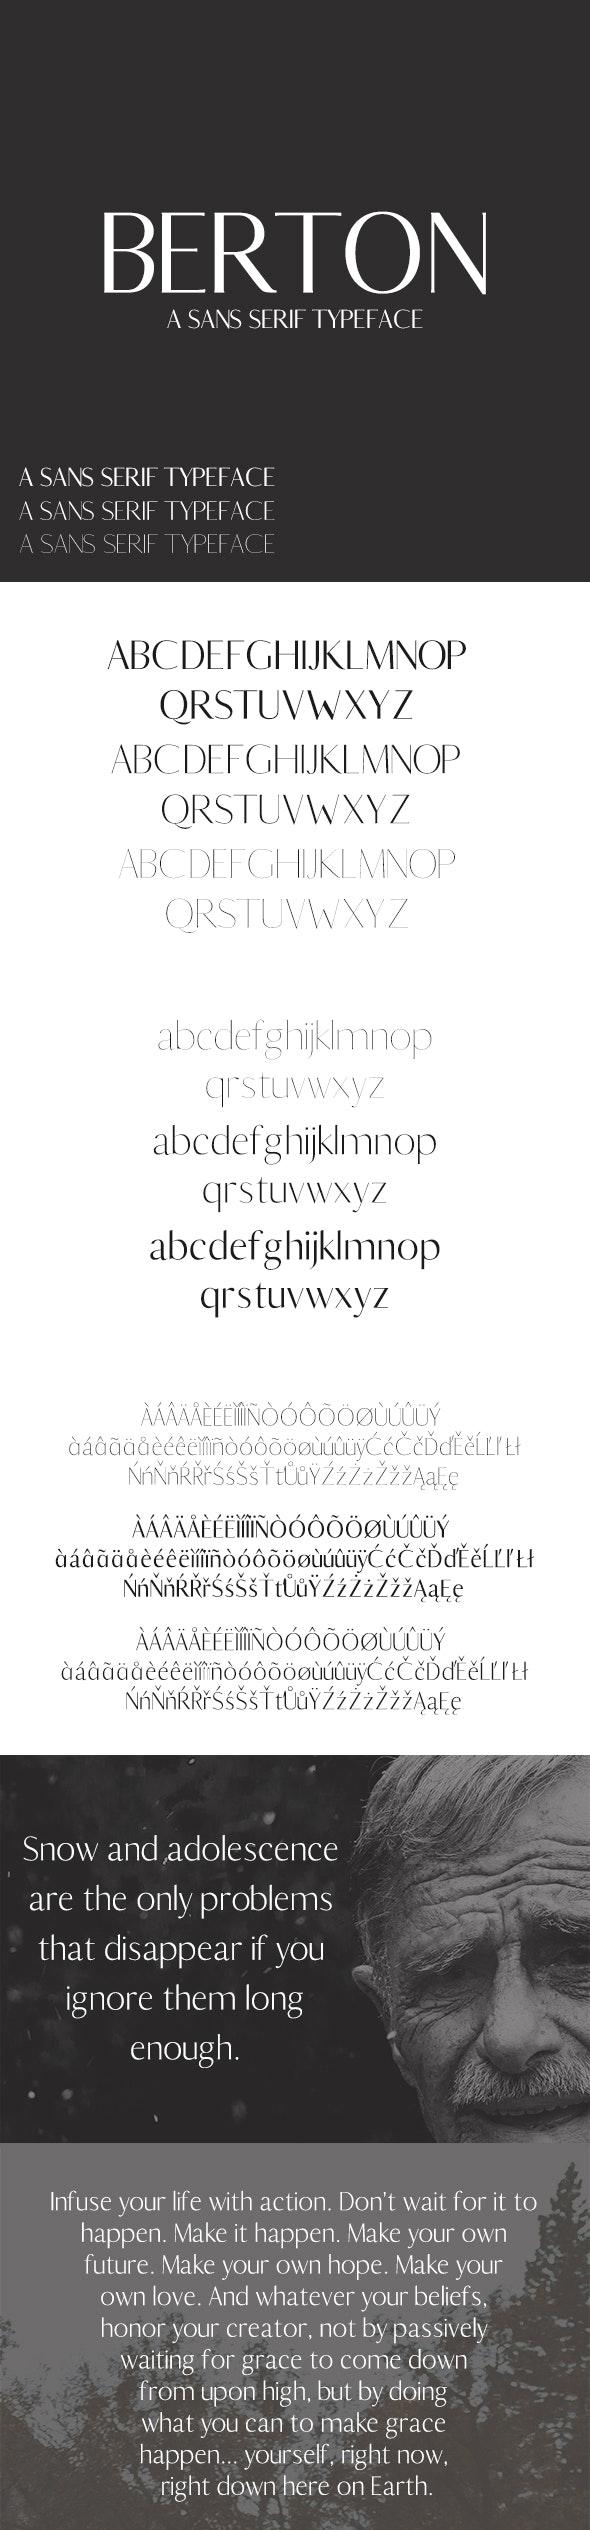 Berton Sans Serif Typeface - Sans-Serif Fonts